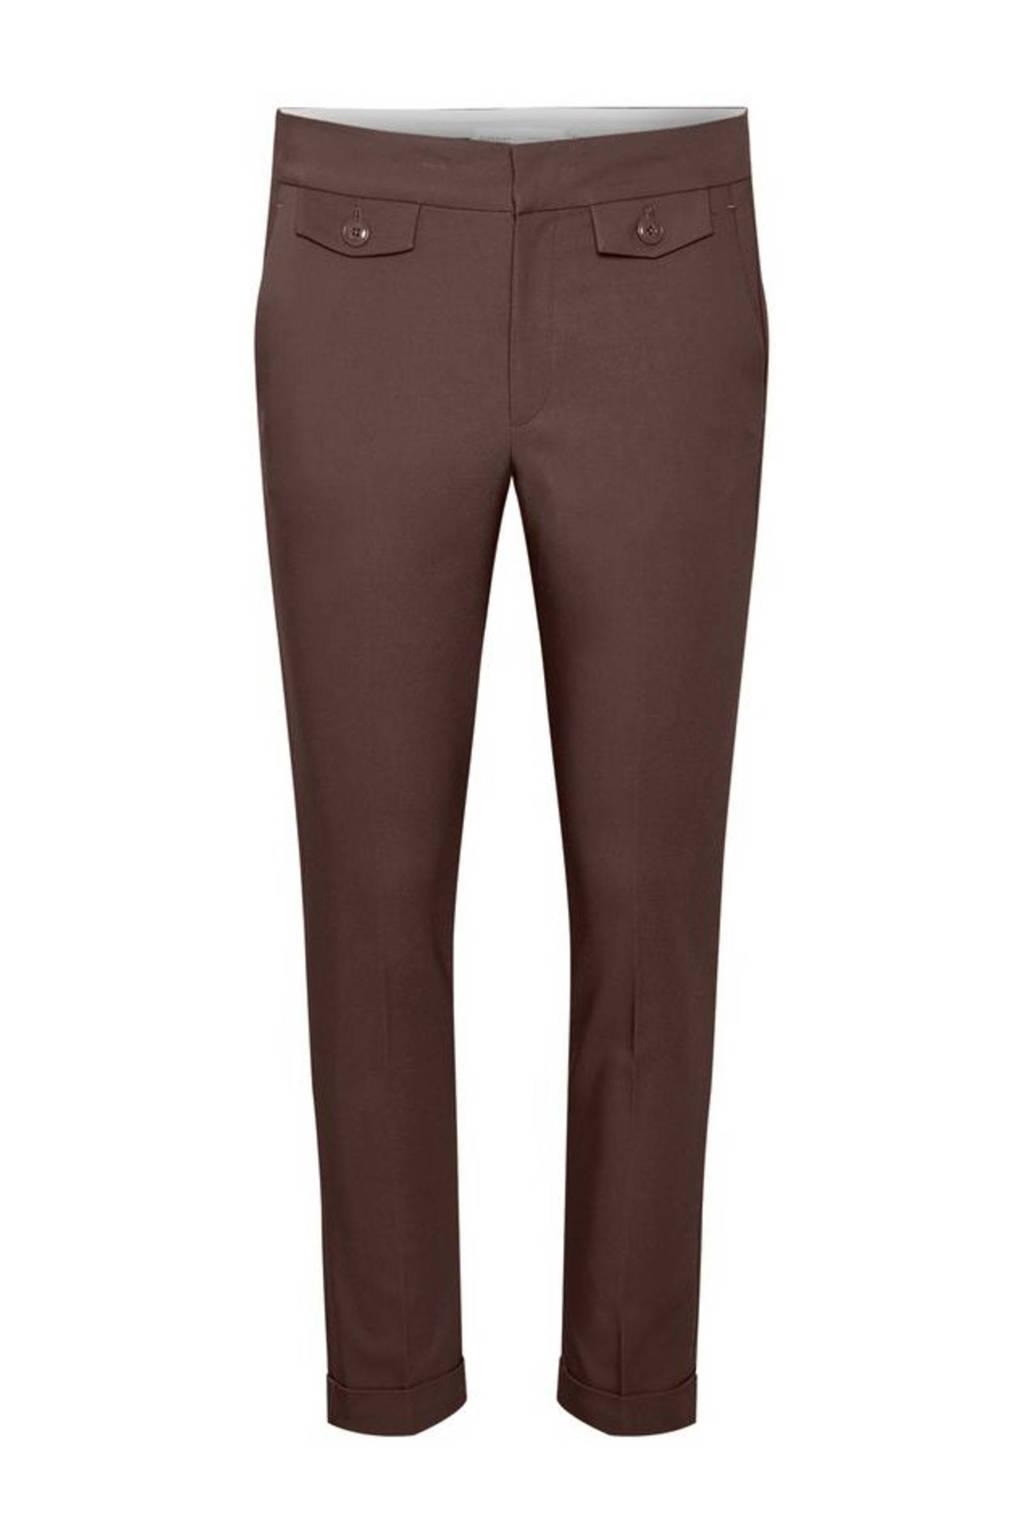 Inwear cropped regular fit pantalon Zella bruin, Bruin